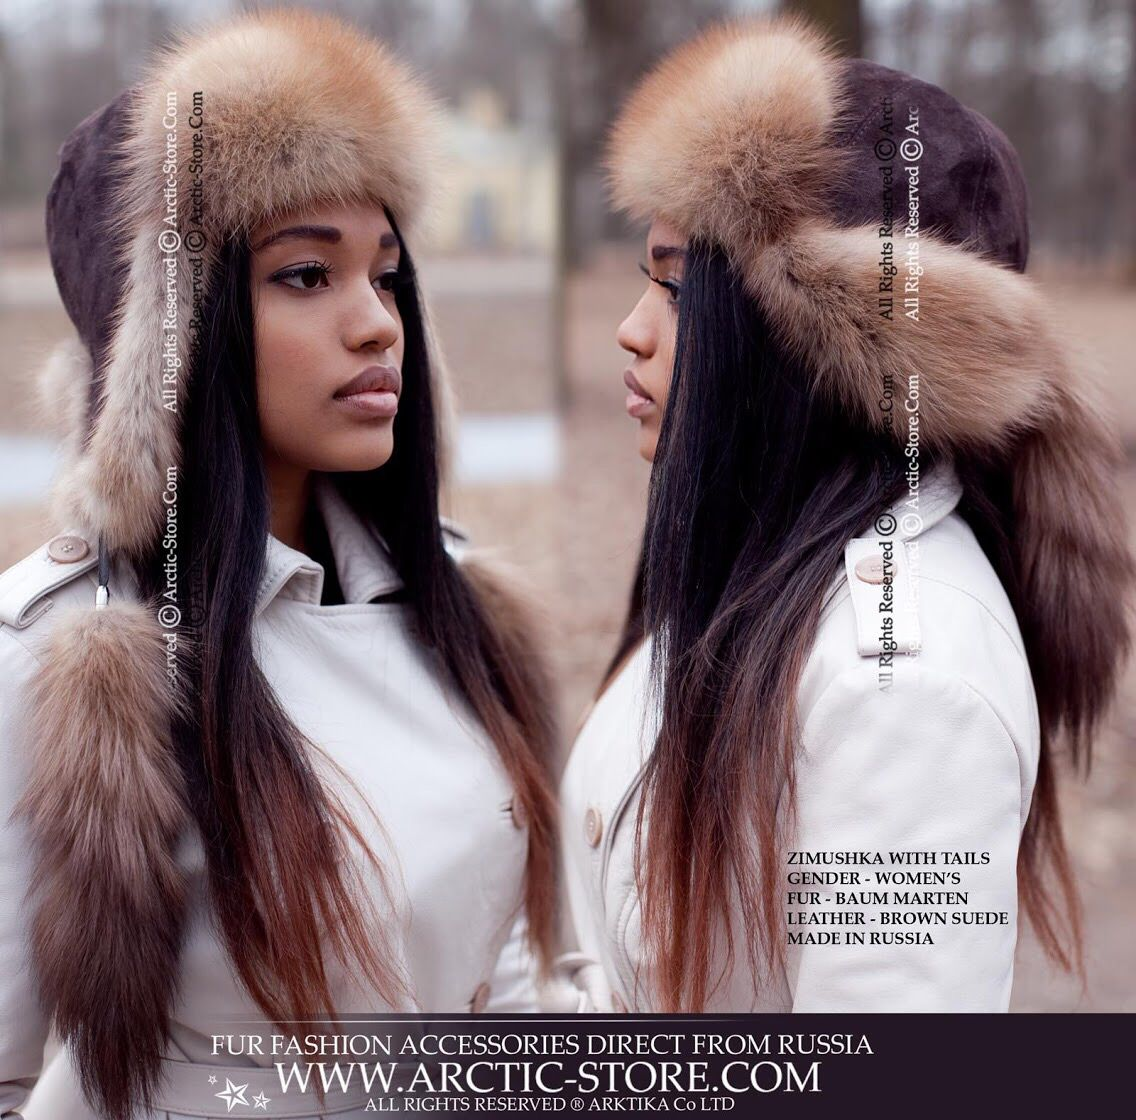 Zimushka Fur Hat With Tails Baum Marten Hats Fur Hat Fur